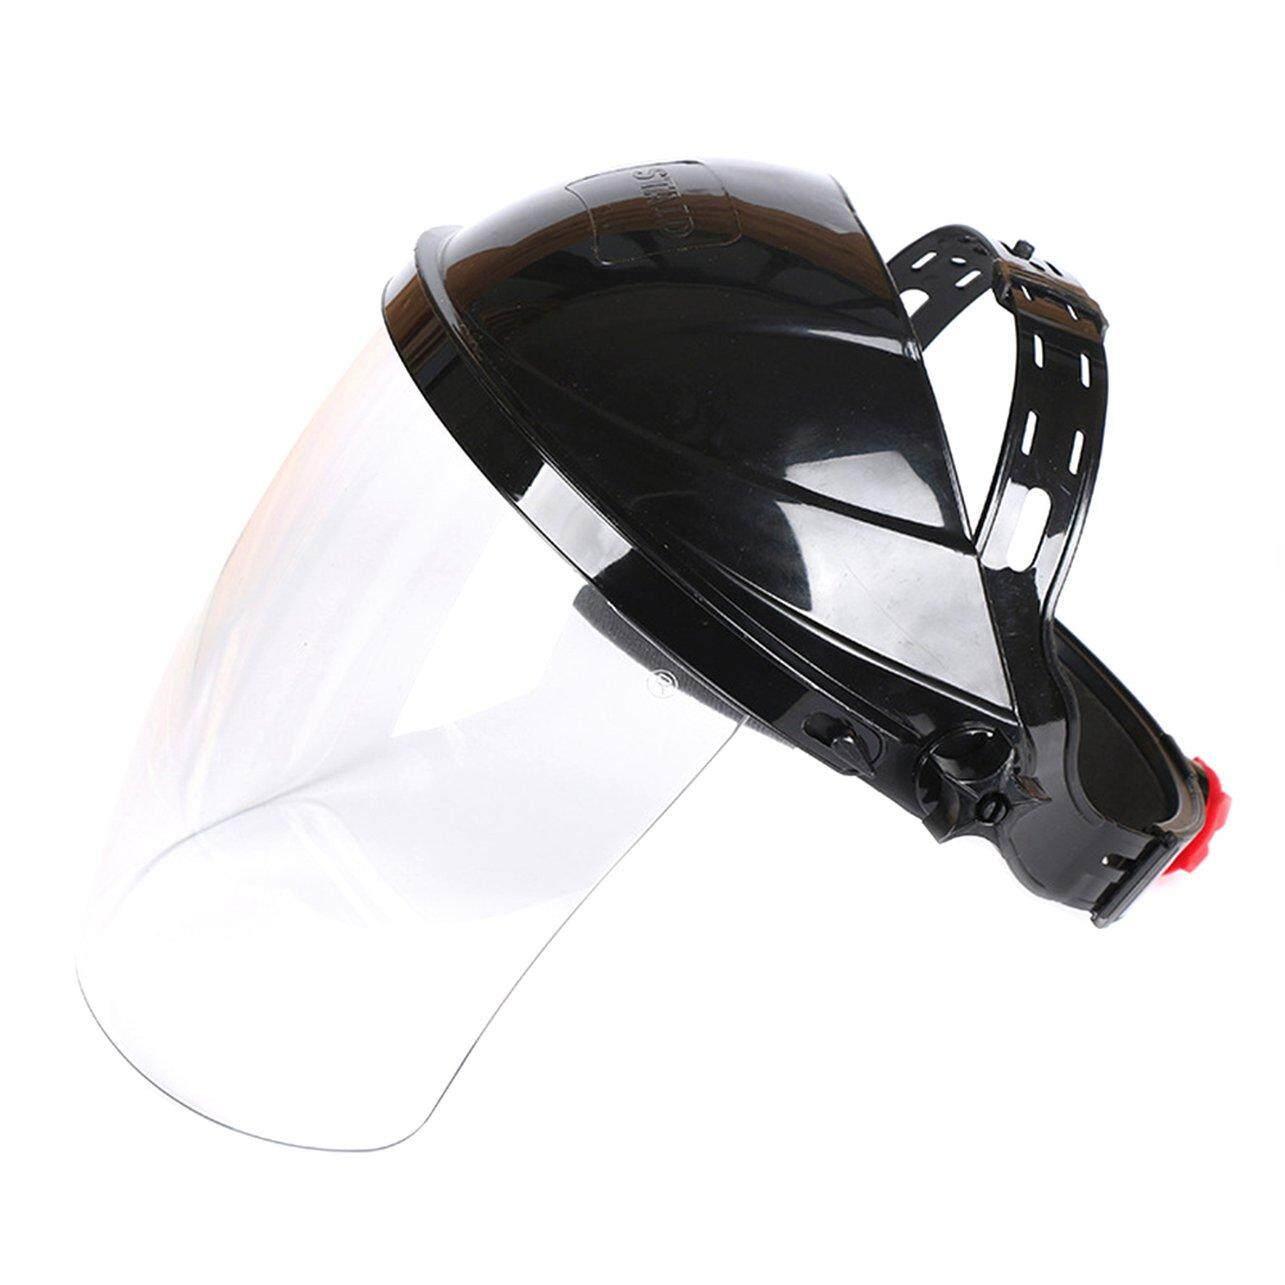 Hot Sales Portable Transparent Lens Anti-UV Anti-shock Welding Helmet Face Shield Mask